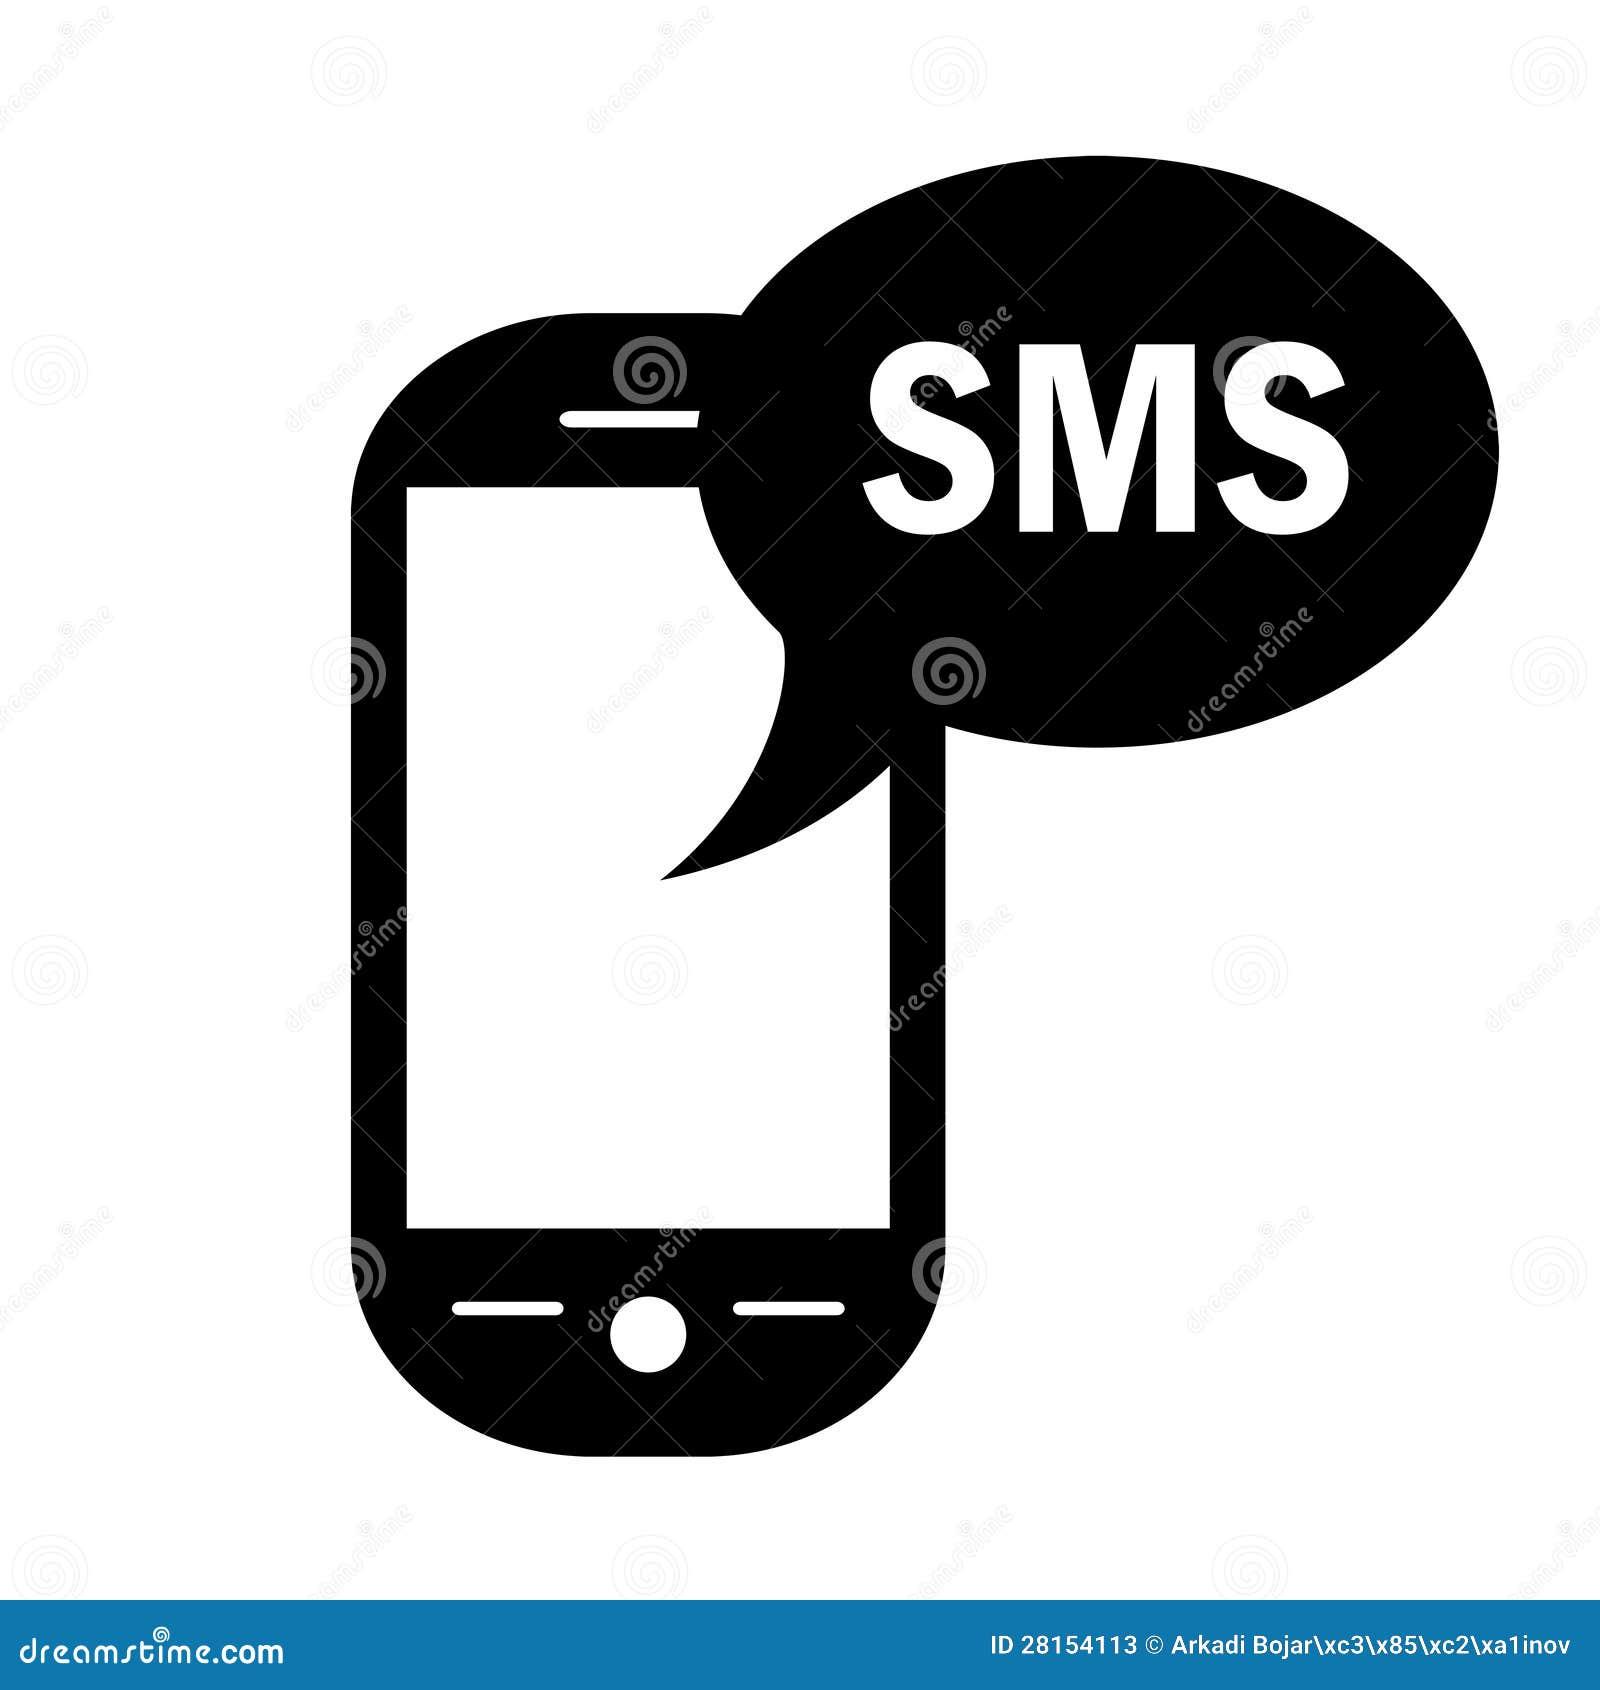 Sms symbol